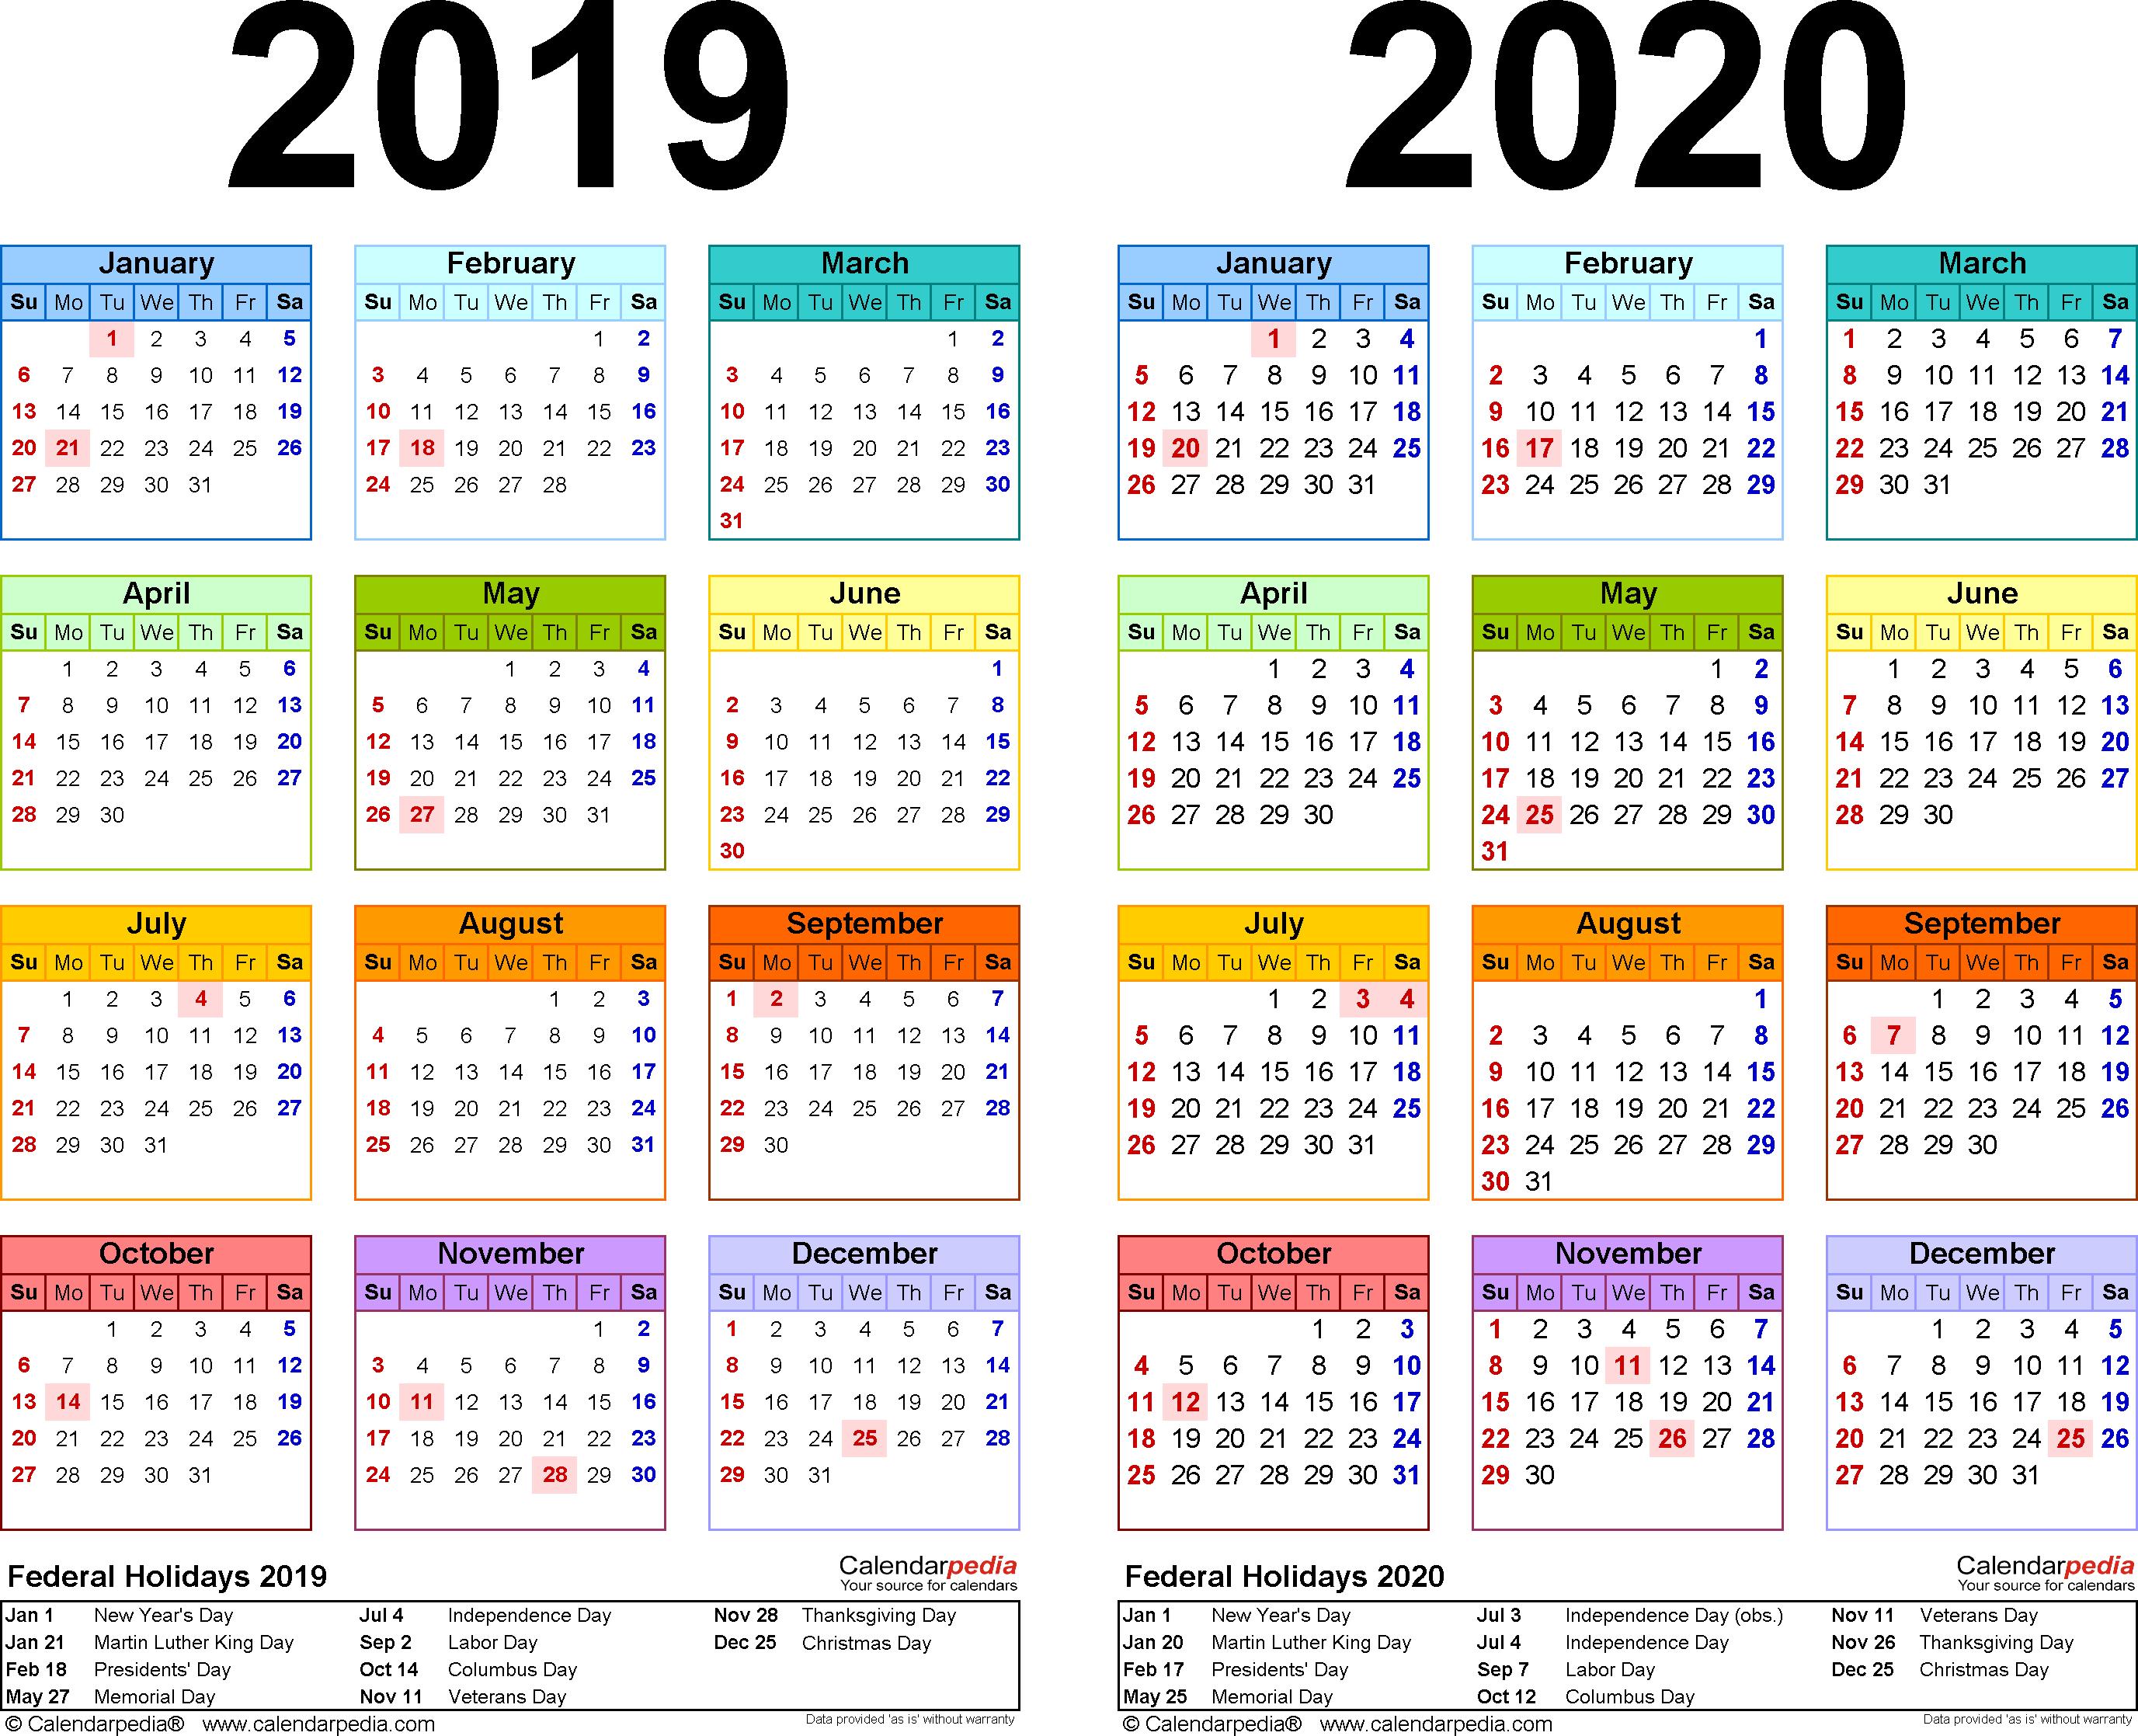 2019-2020 Calendar - Free Printable Two-Year Word Calendars for Edit Free Calendar Template 2019-2020